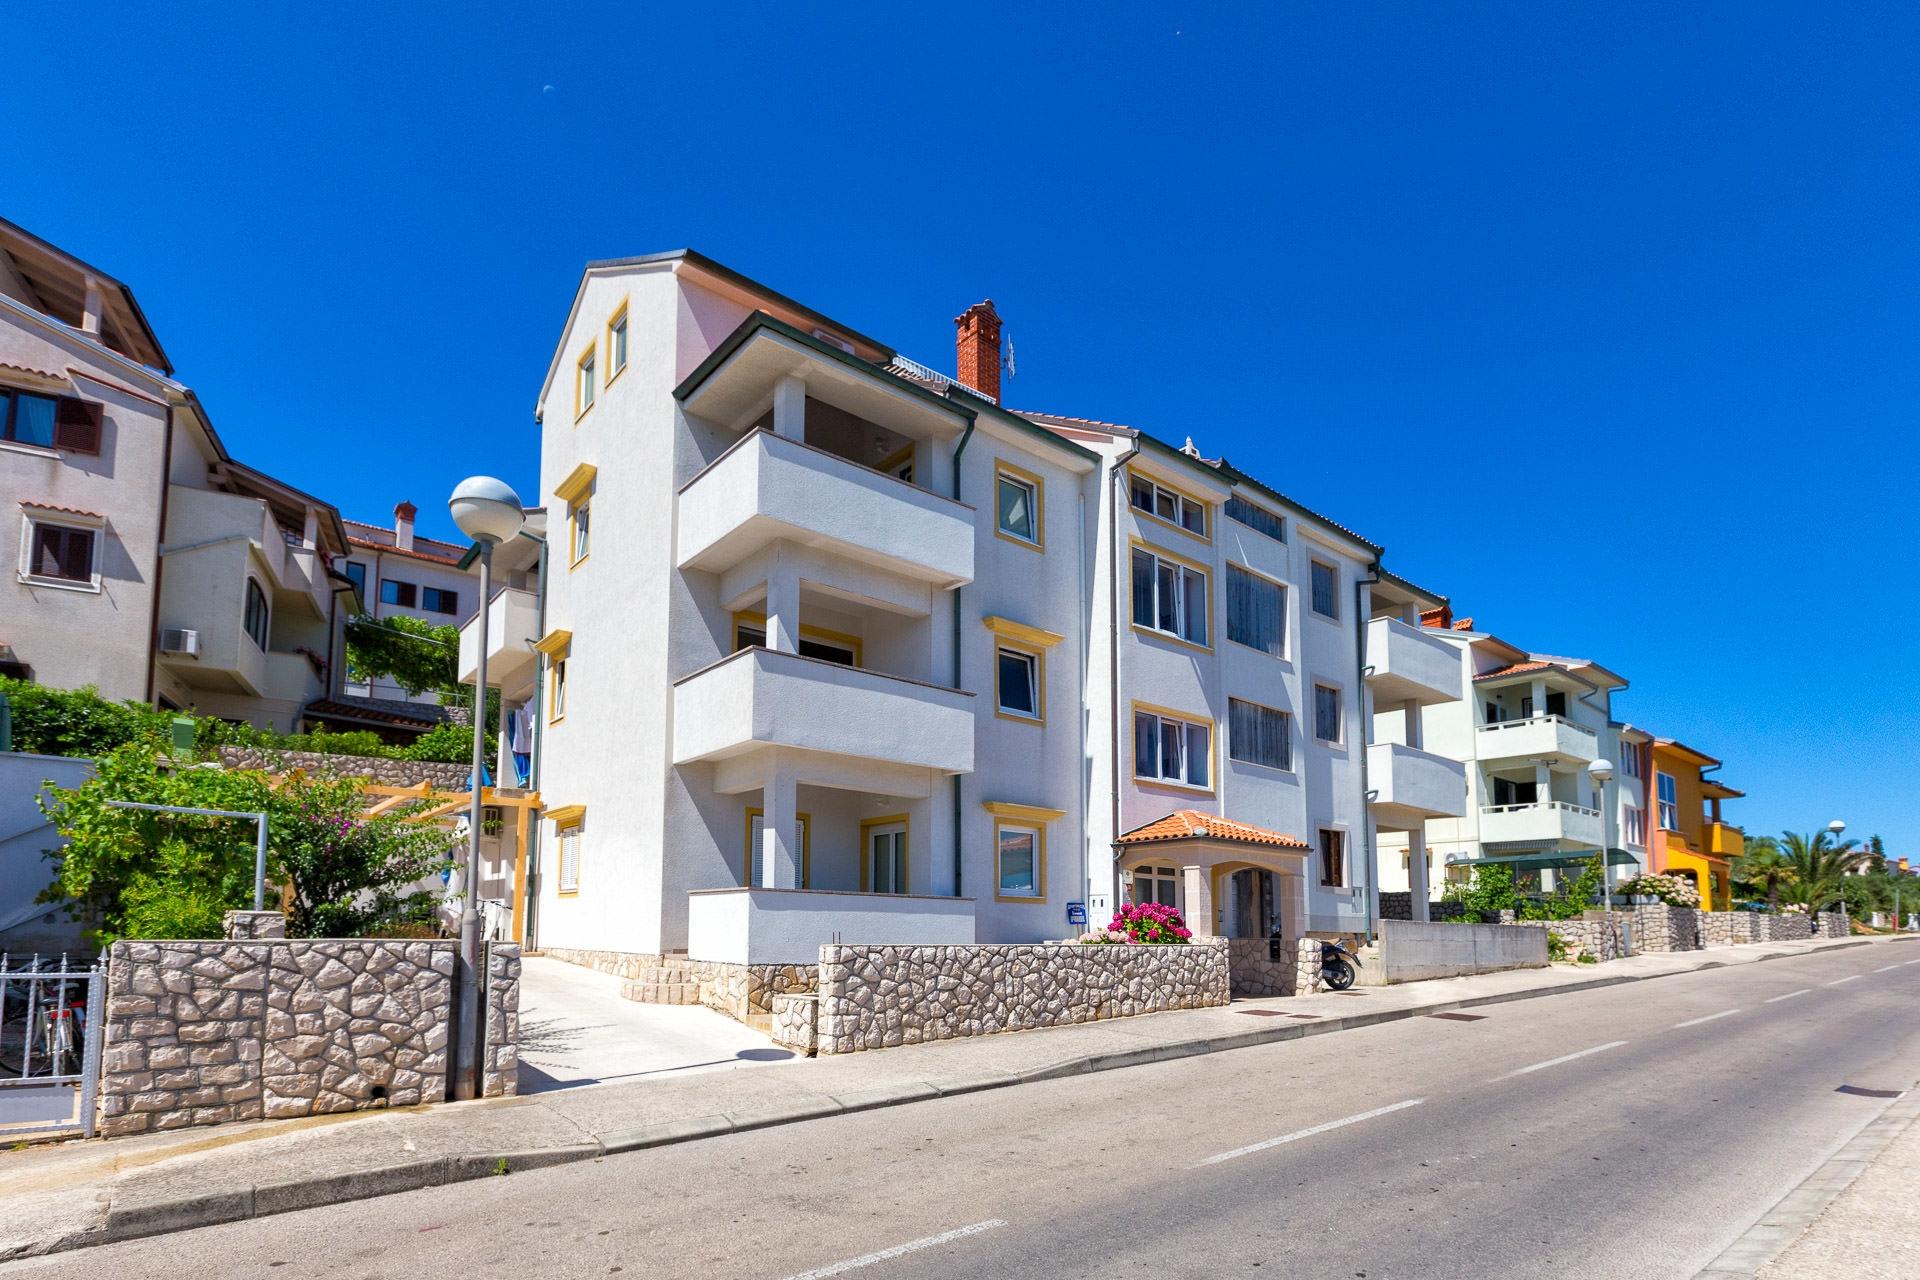 2925 - Mali Losinj - Apartments Croatia